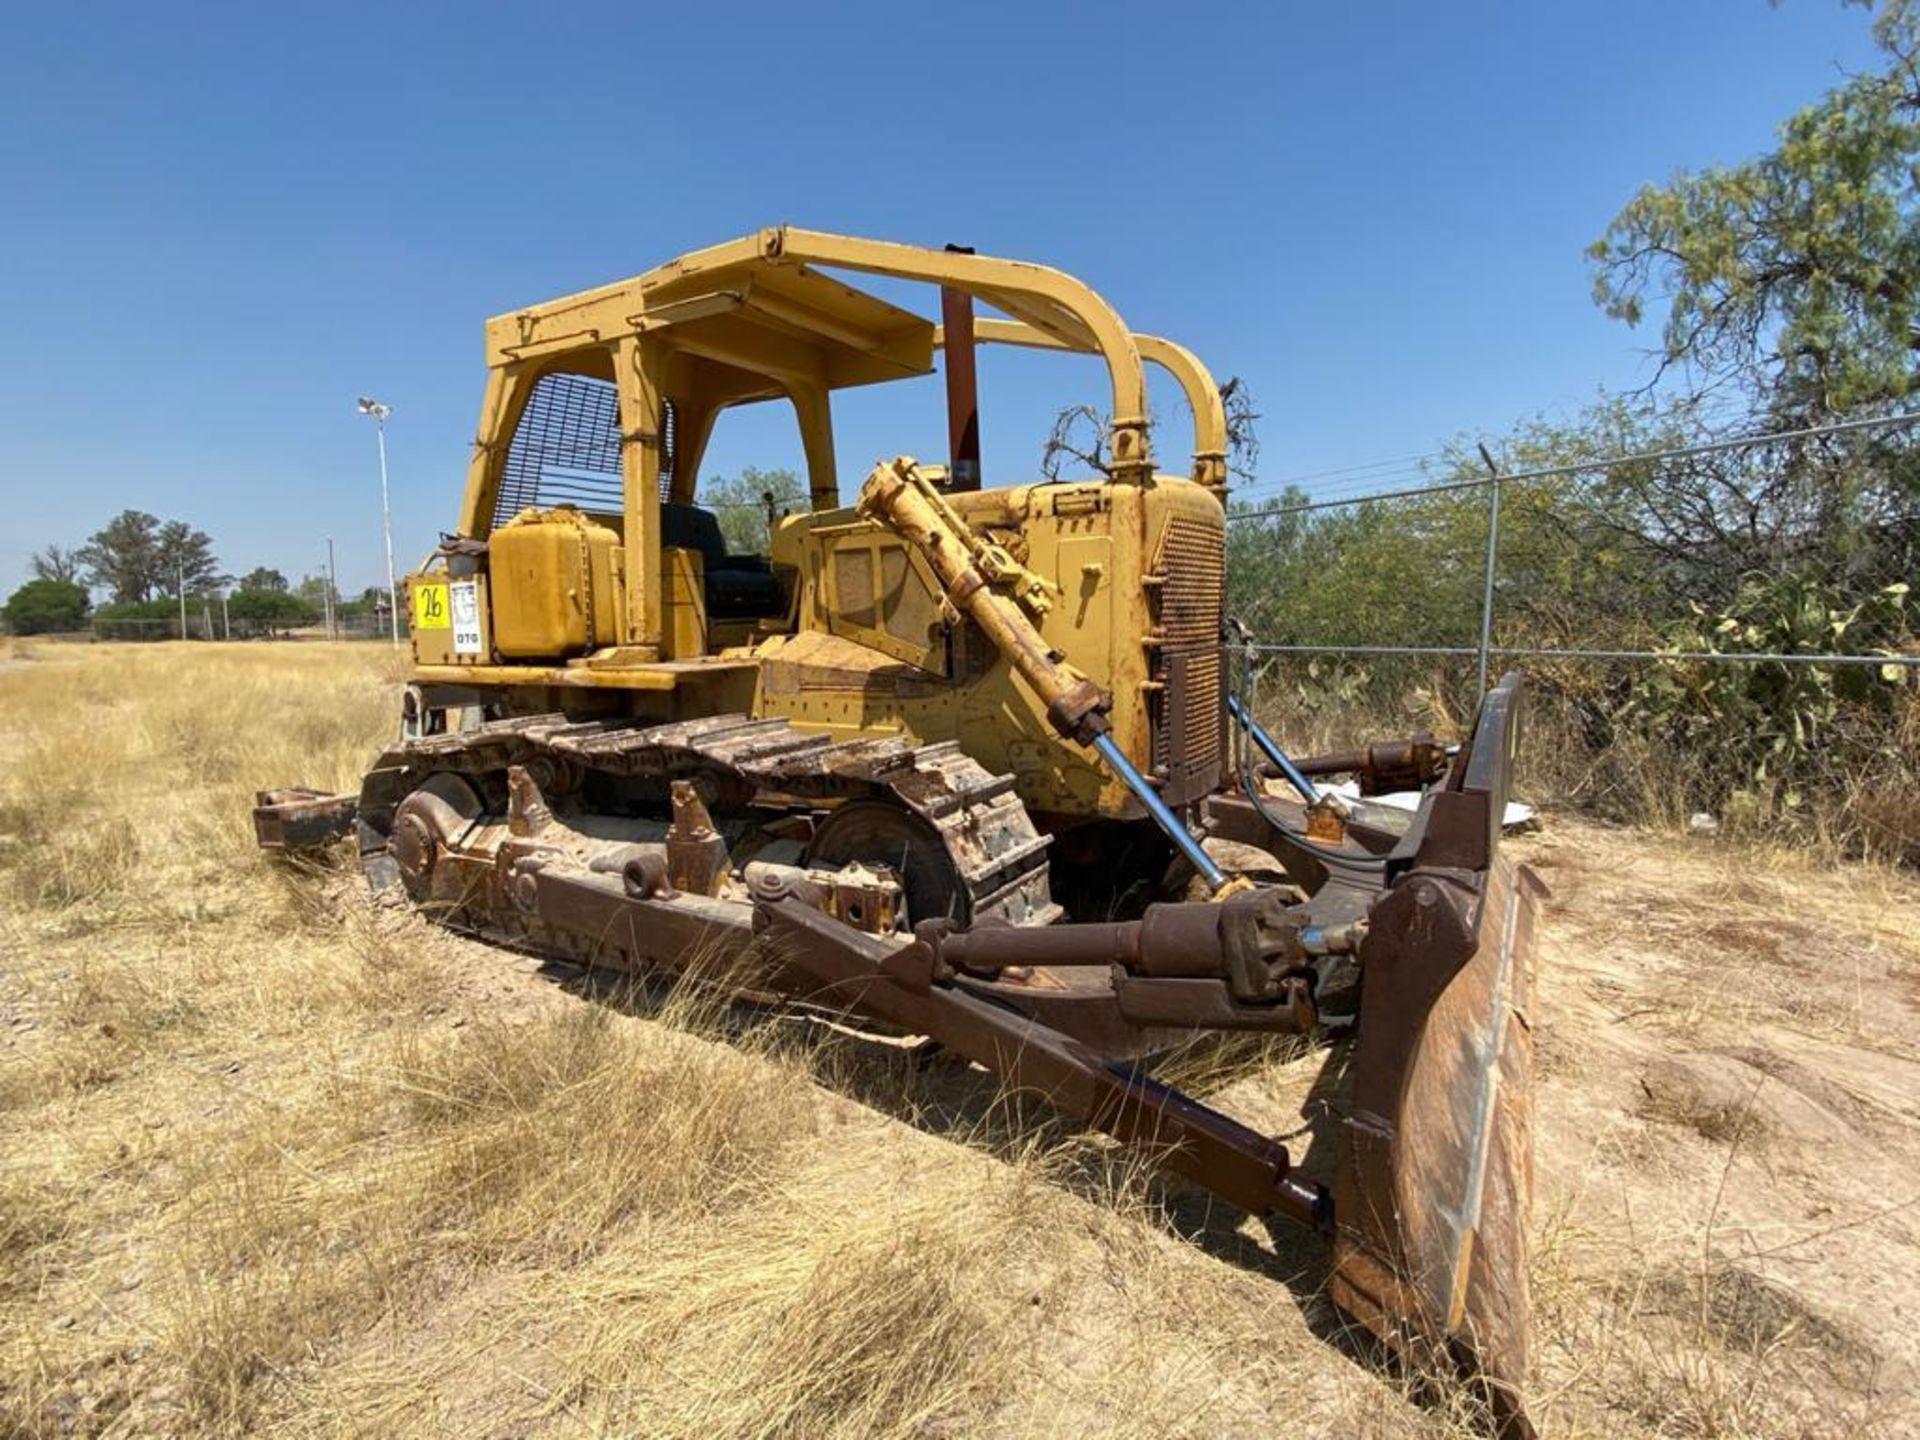 Caterpillar D7G Bulldozer, Serial number 92V5897, Diesel motor - Image 2 of 48